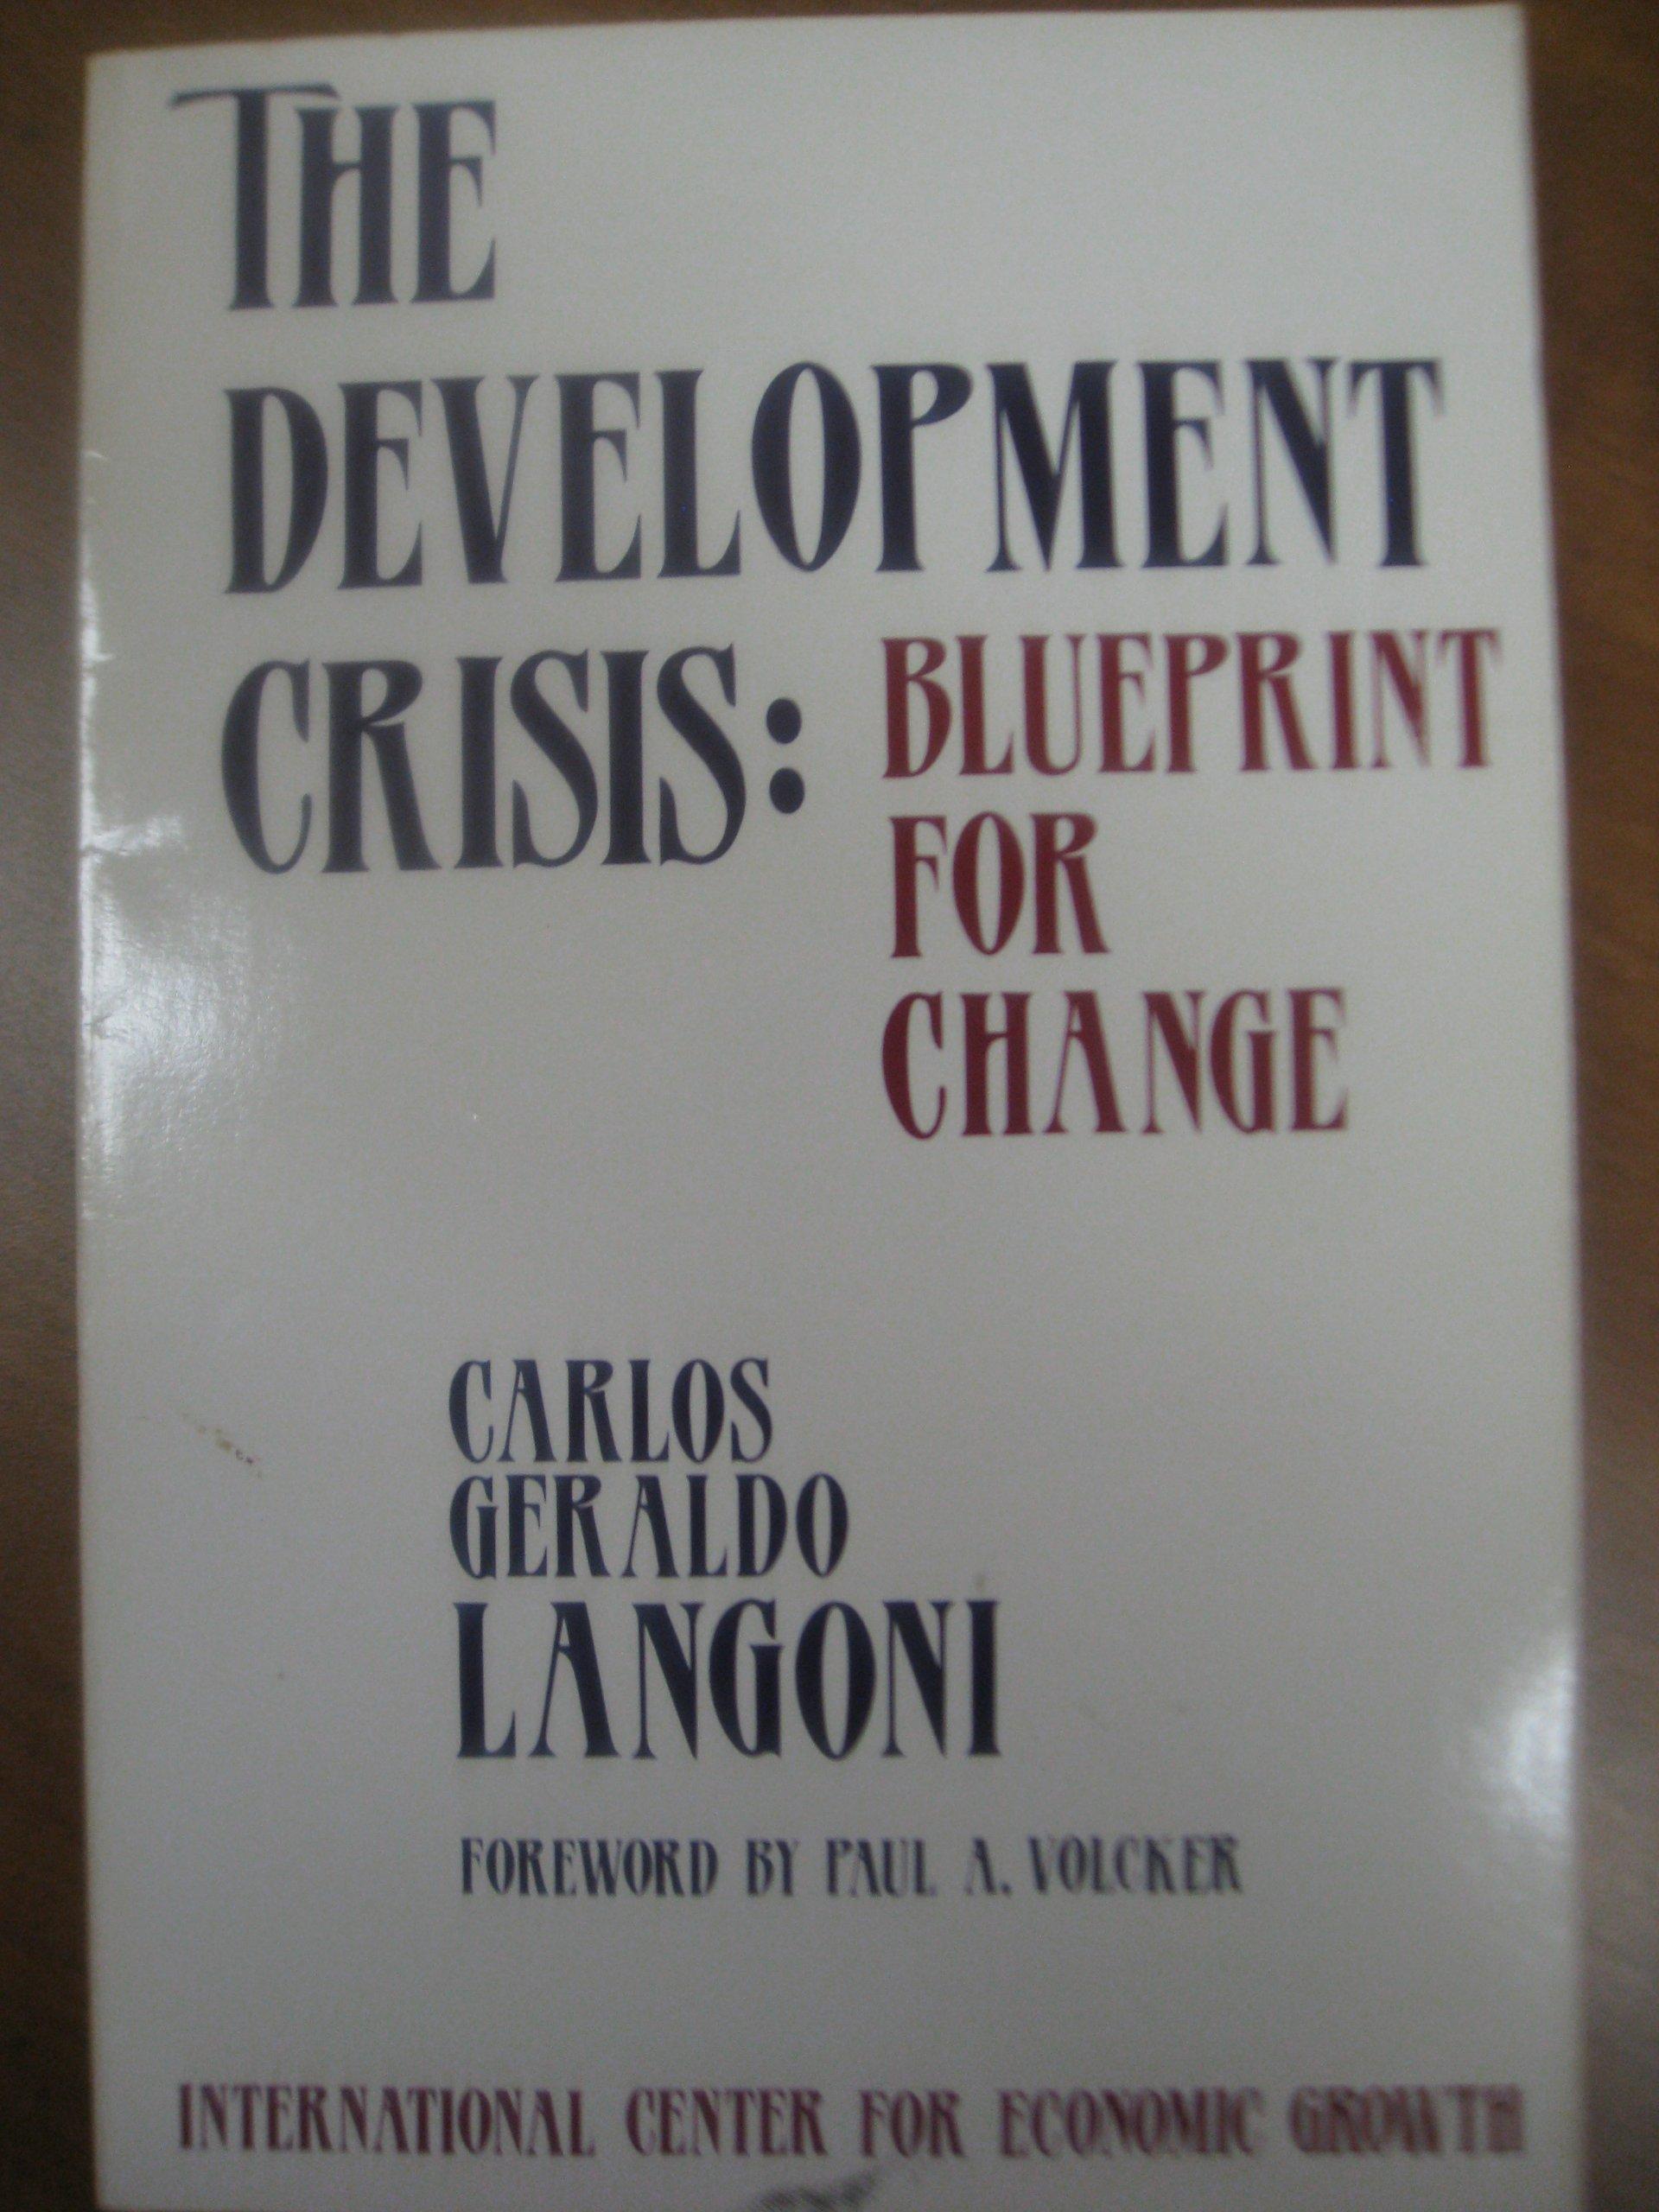 The development crisis blueprint for change english and portuguese the development crisis blueprint for change english and portuguese edition carlos geraldo langoni 9780917616945 amazon books malvernweather Choice Image